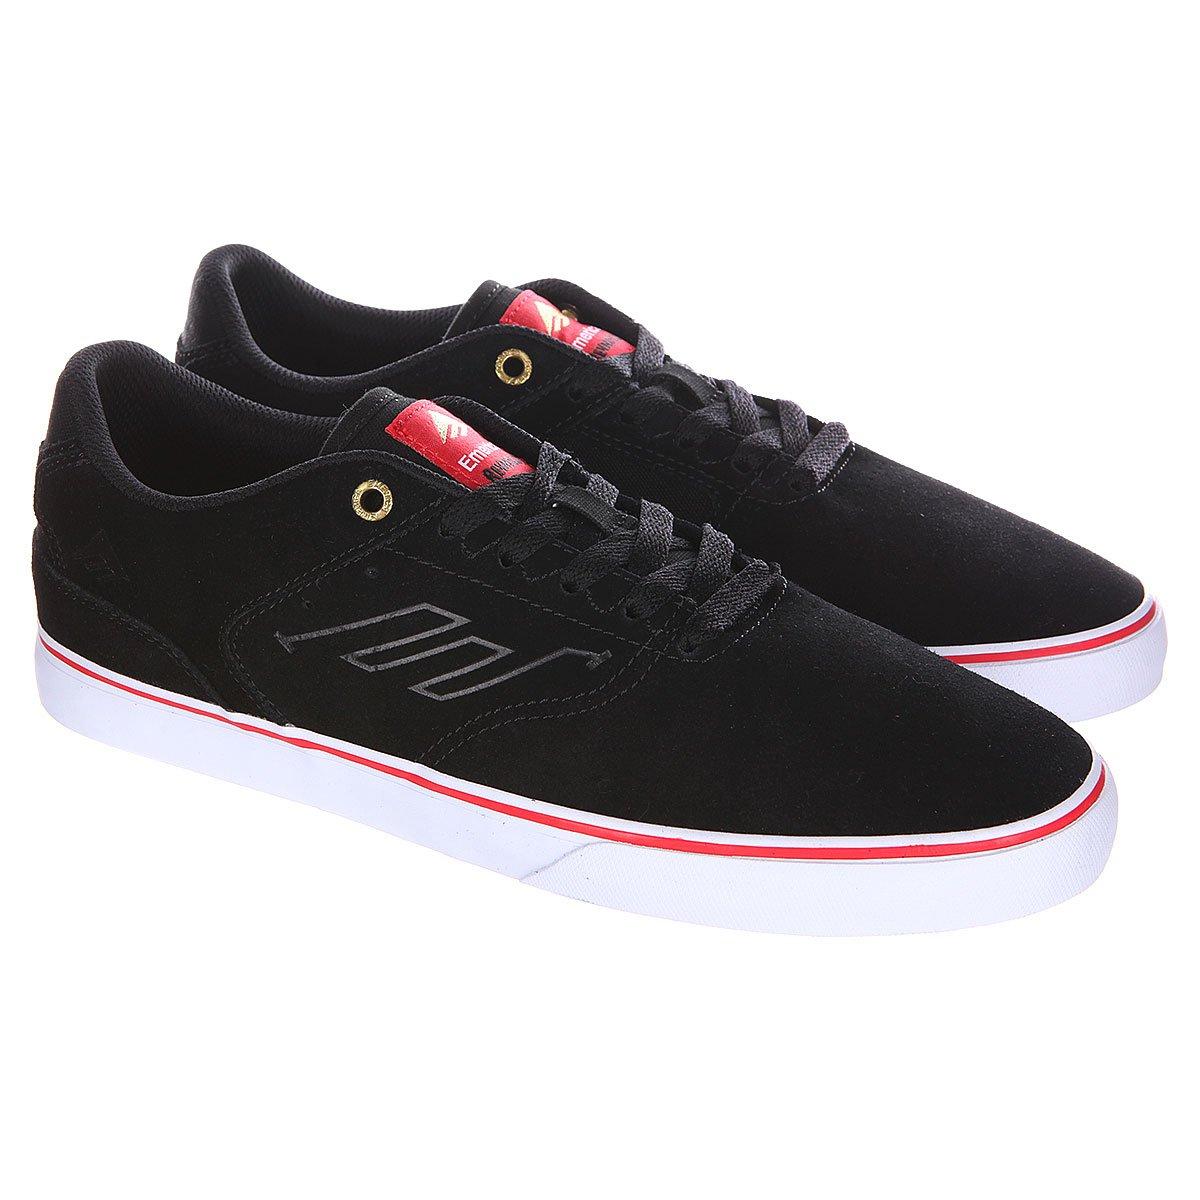 889348a8 Купить кеды низкие Emerica The Reynolds Low Vulc Black/Red/White в ...